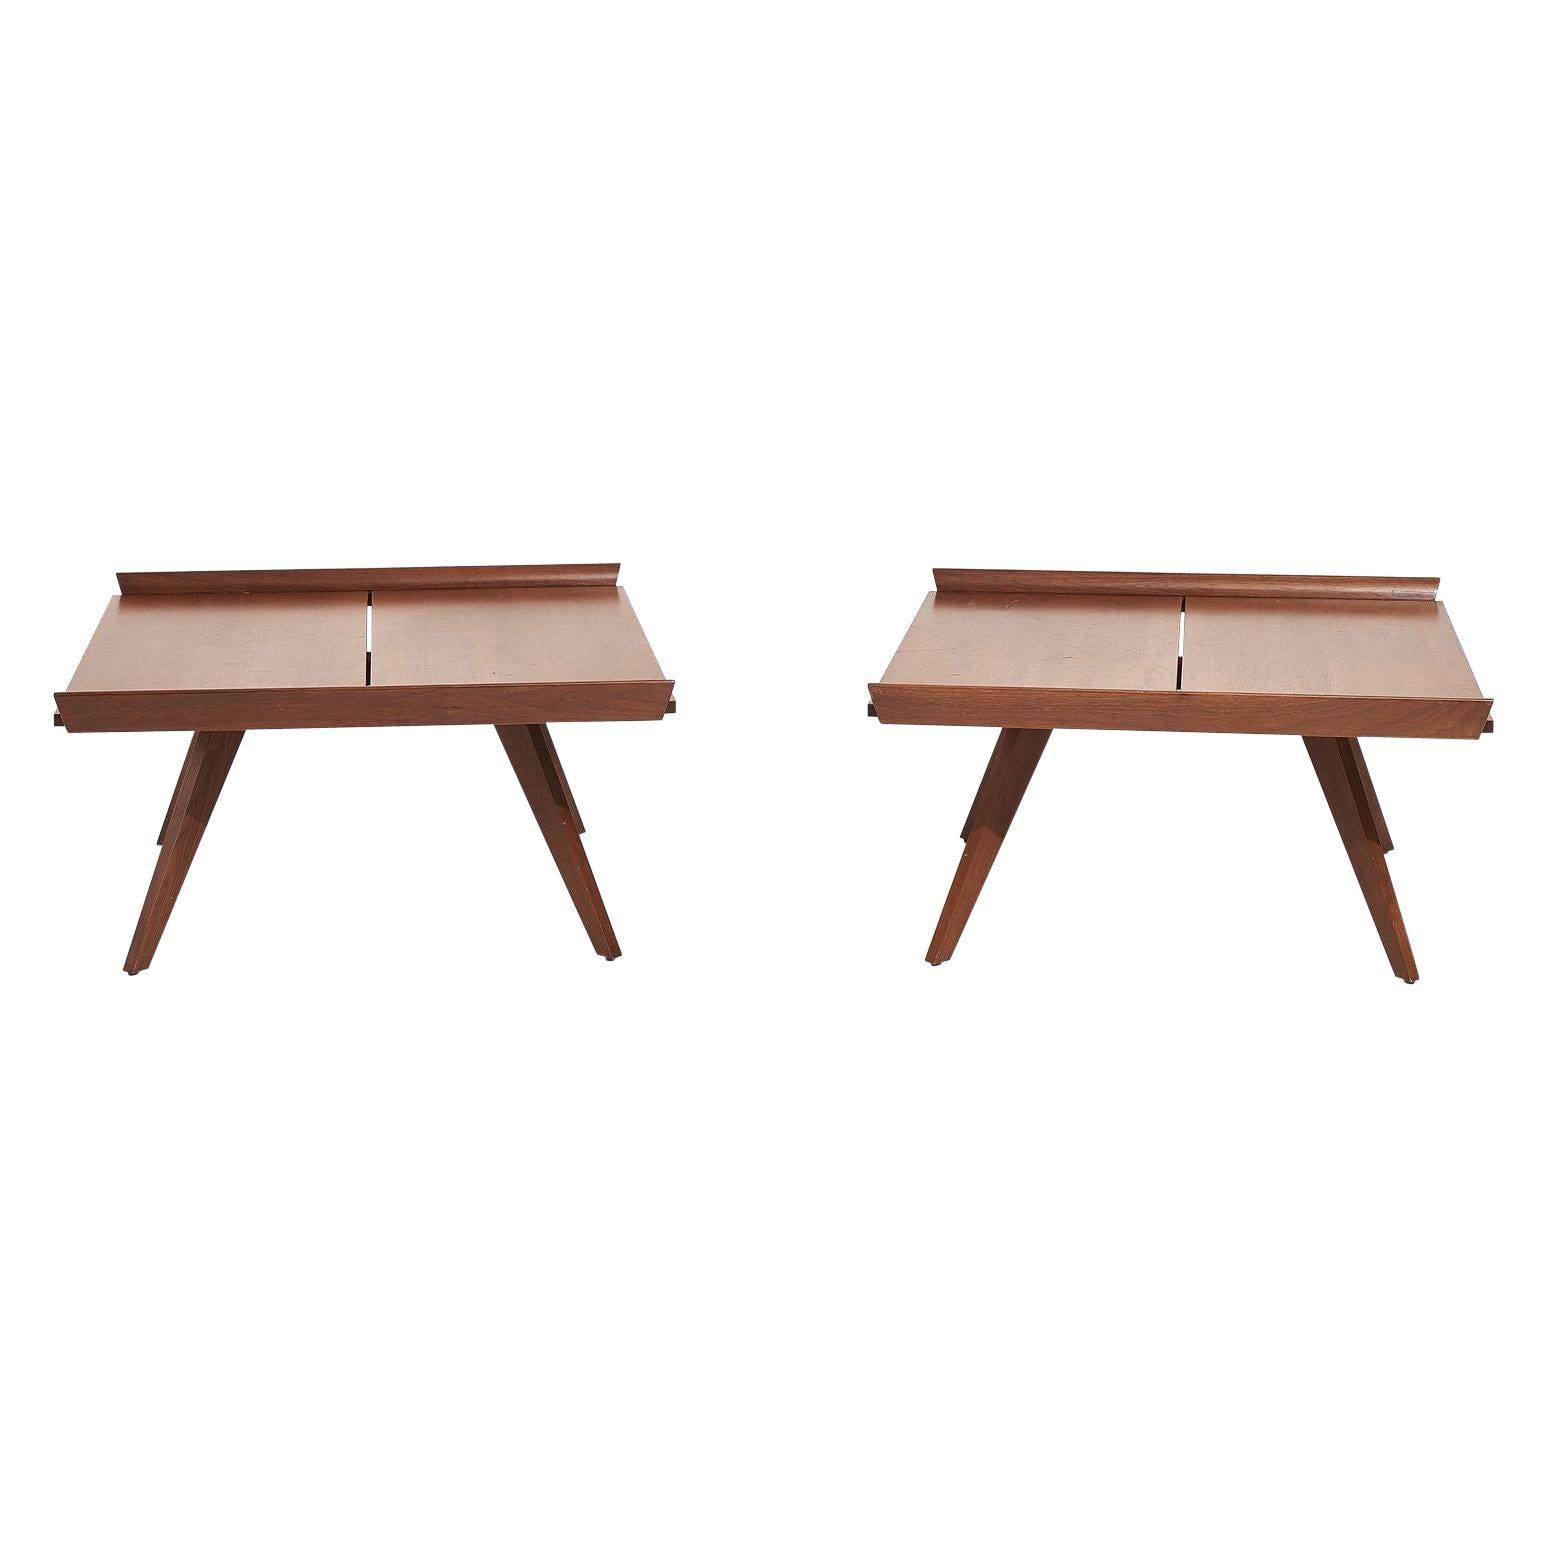 George Nakashima Splay-Leg Table, Knoll Studio